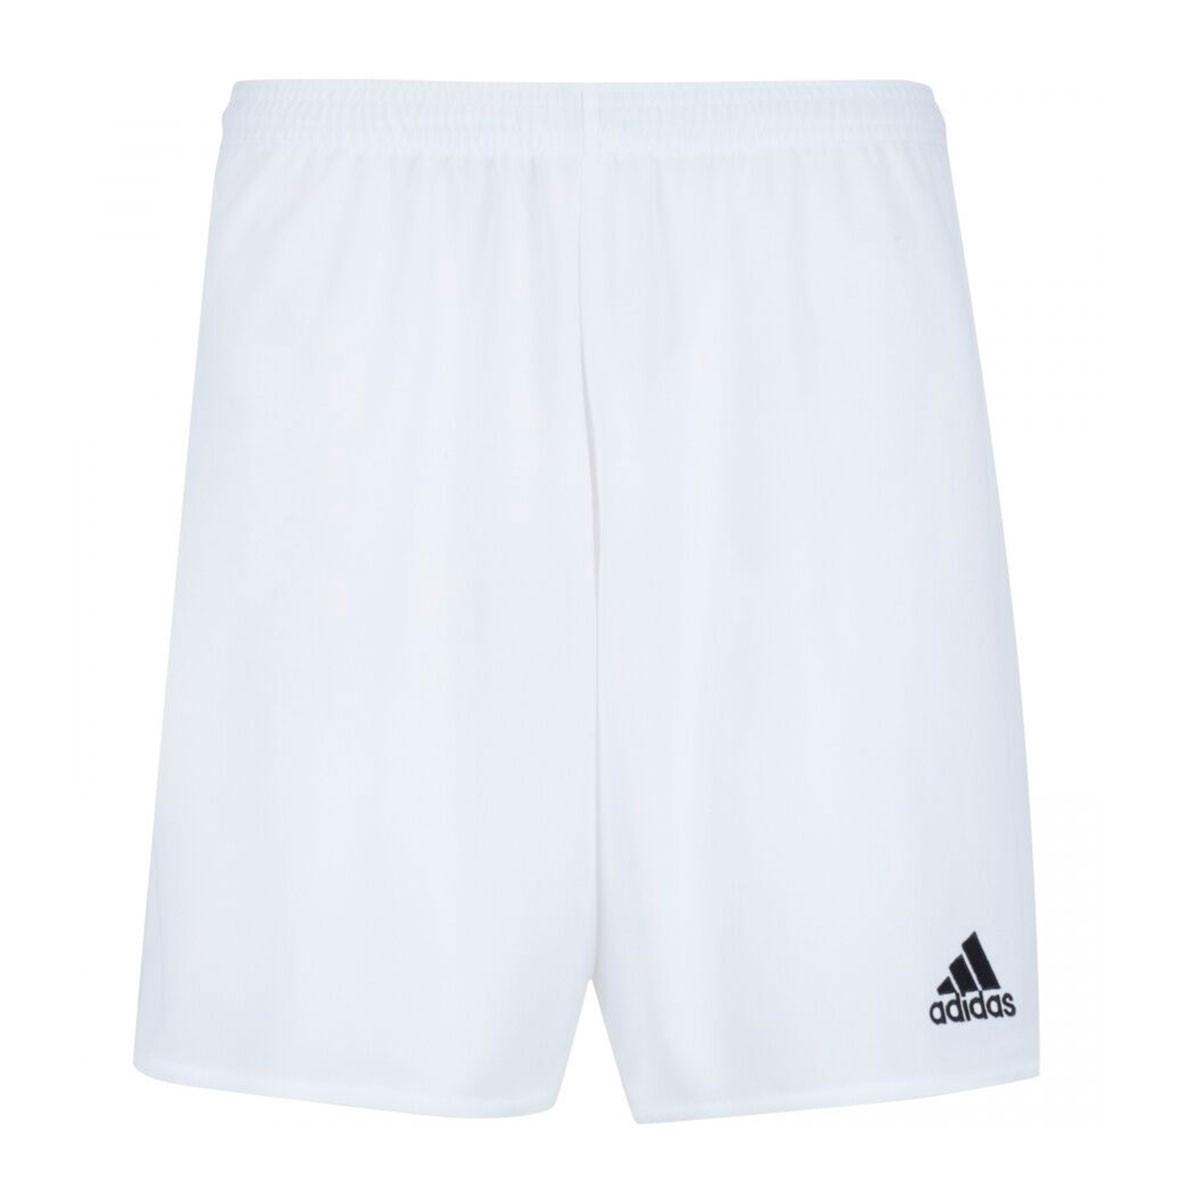 Short Adidas Parma 16 Masculino Branco